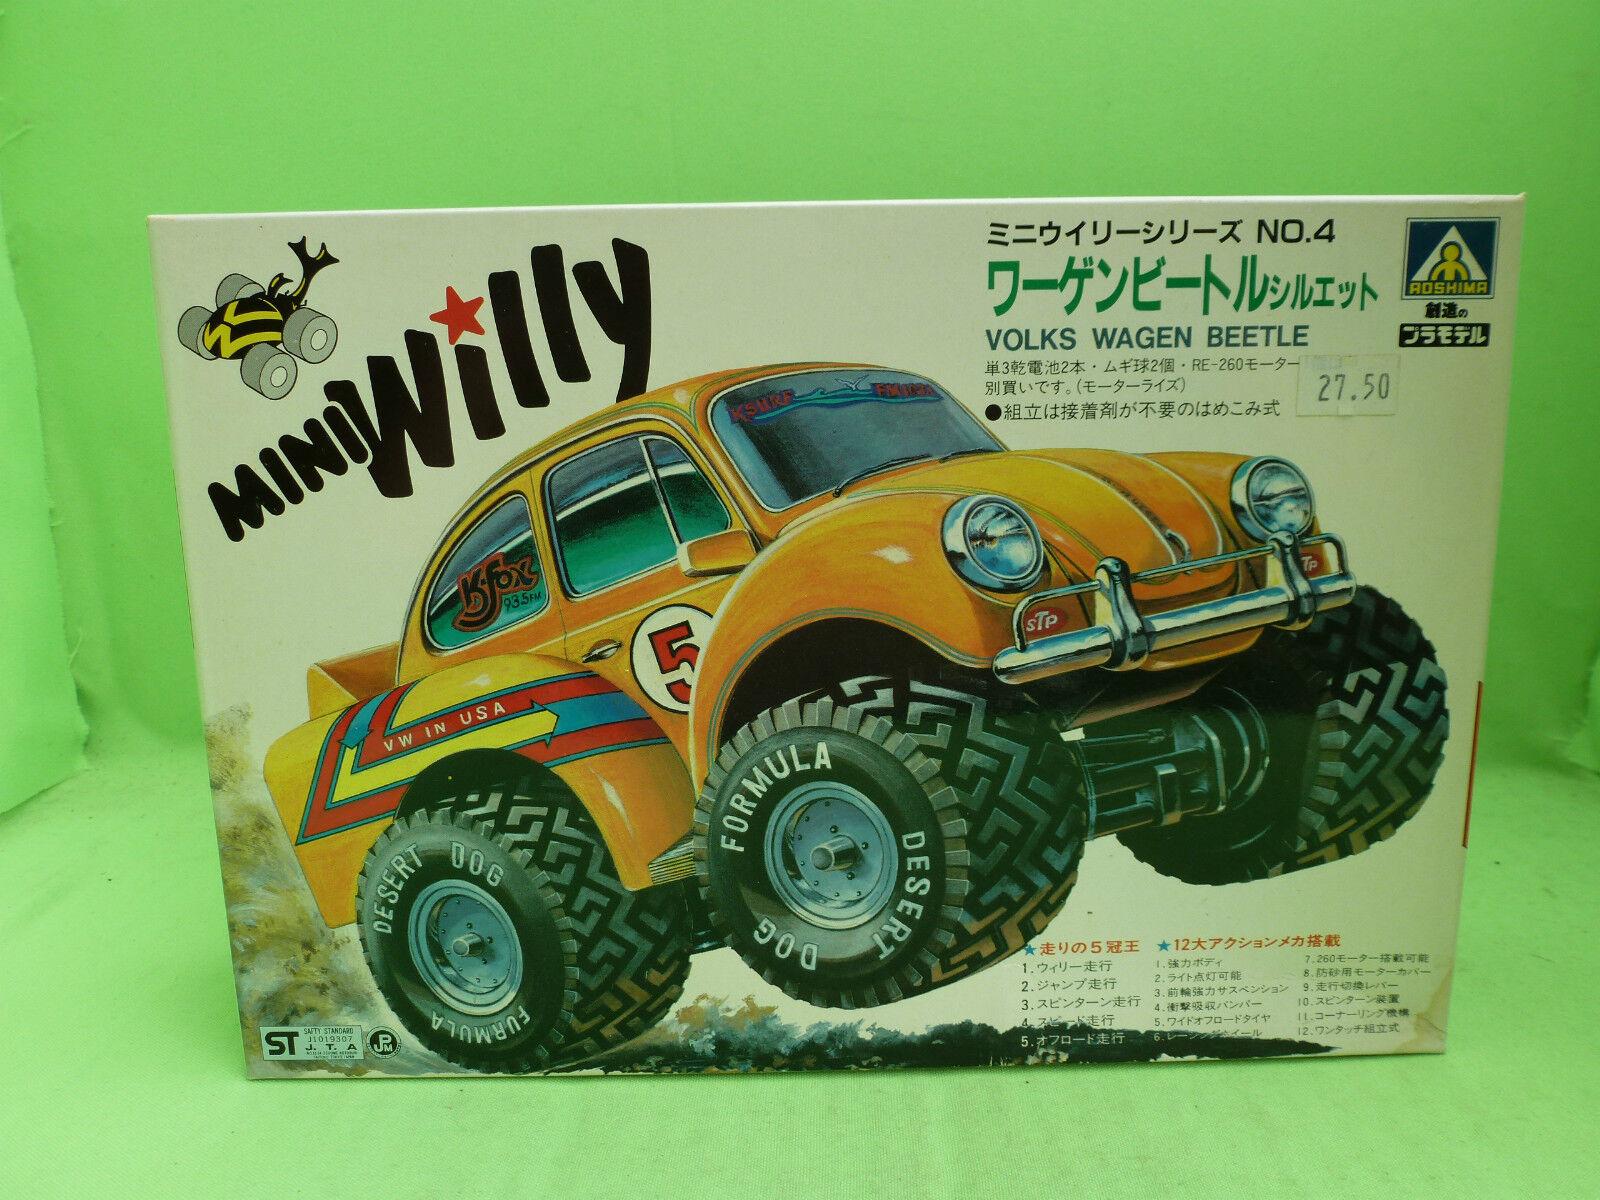 AOSHIMA NO.4 KIT G8-30-500 VW BEETLE KAFER MINIWILLY  - UNBUILT INBOX COMPLETE -